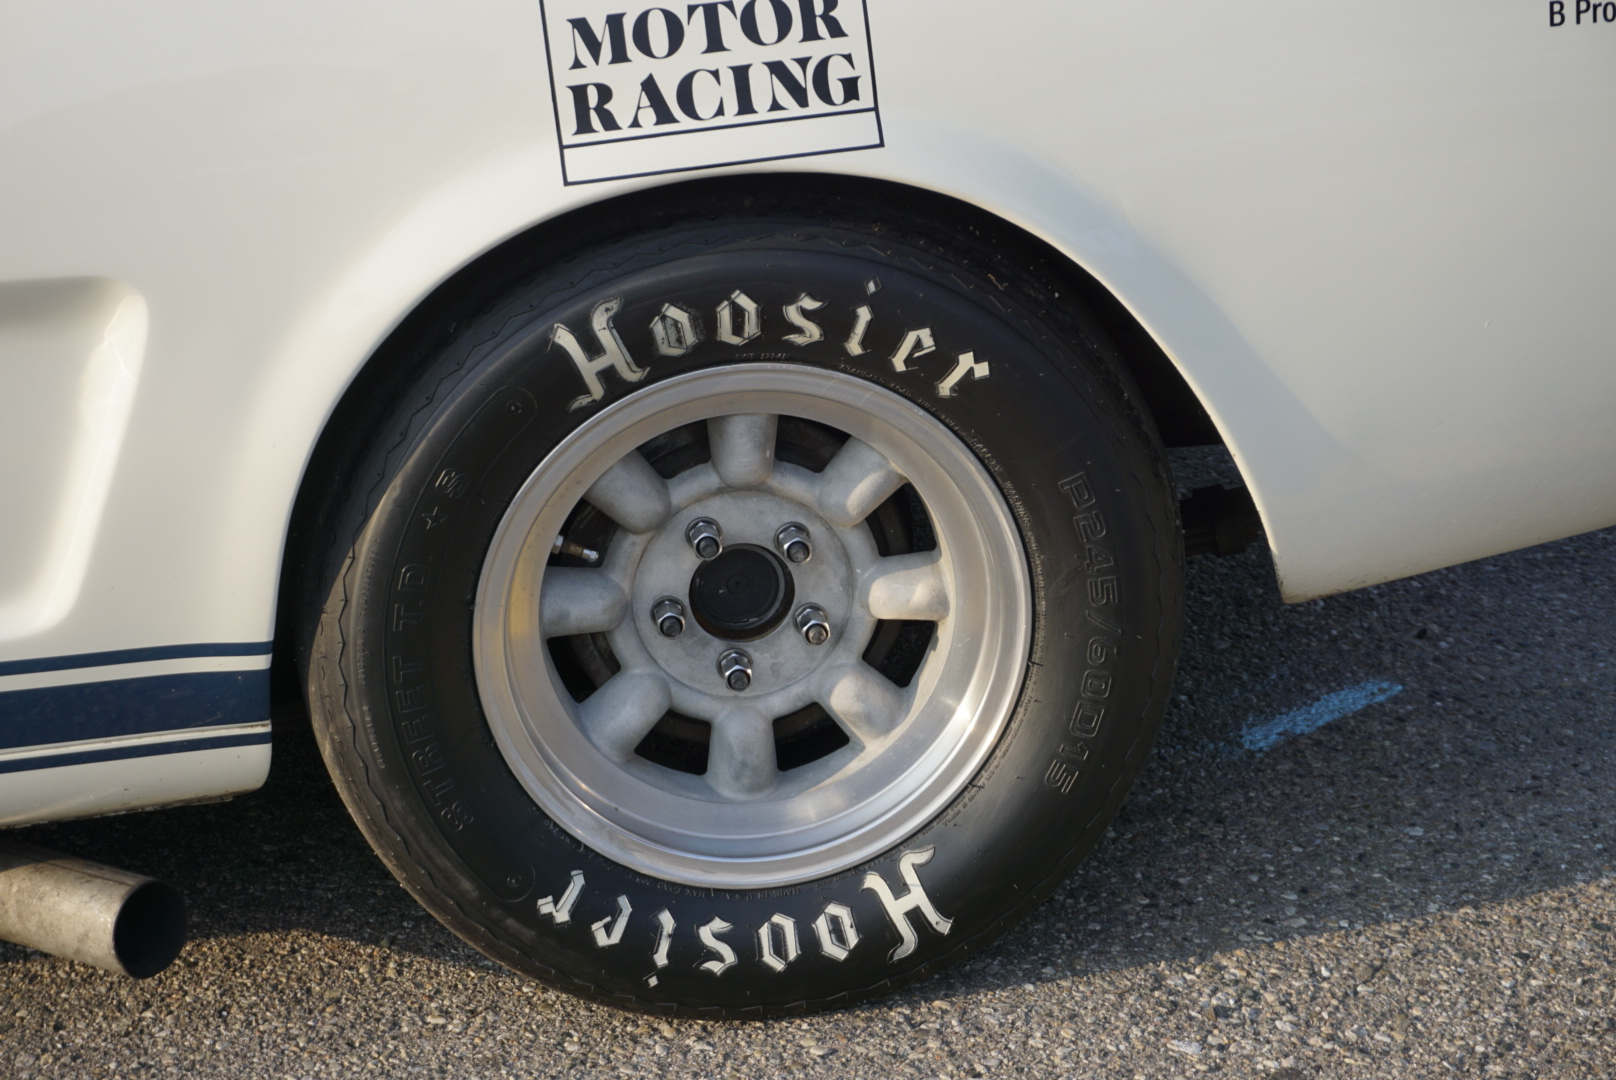 1965 Shelby GT350 Mustang wheel